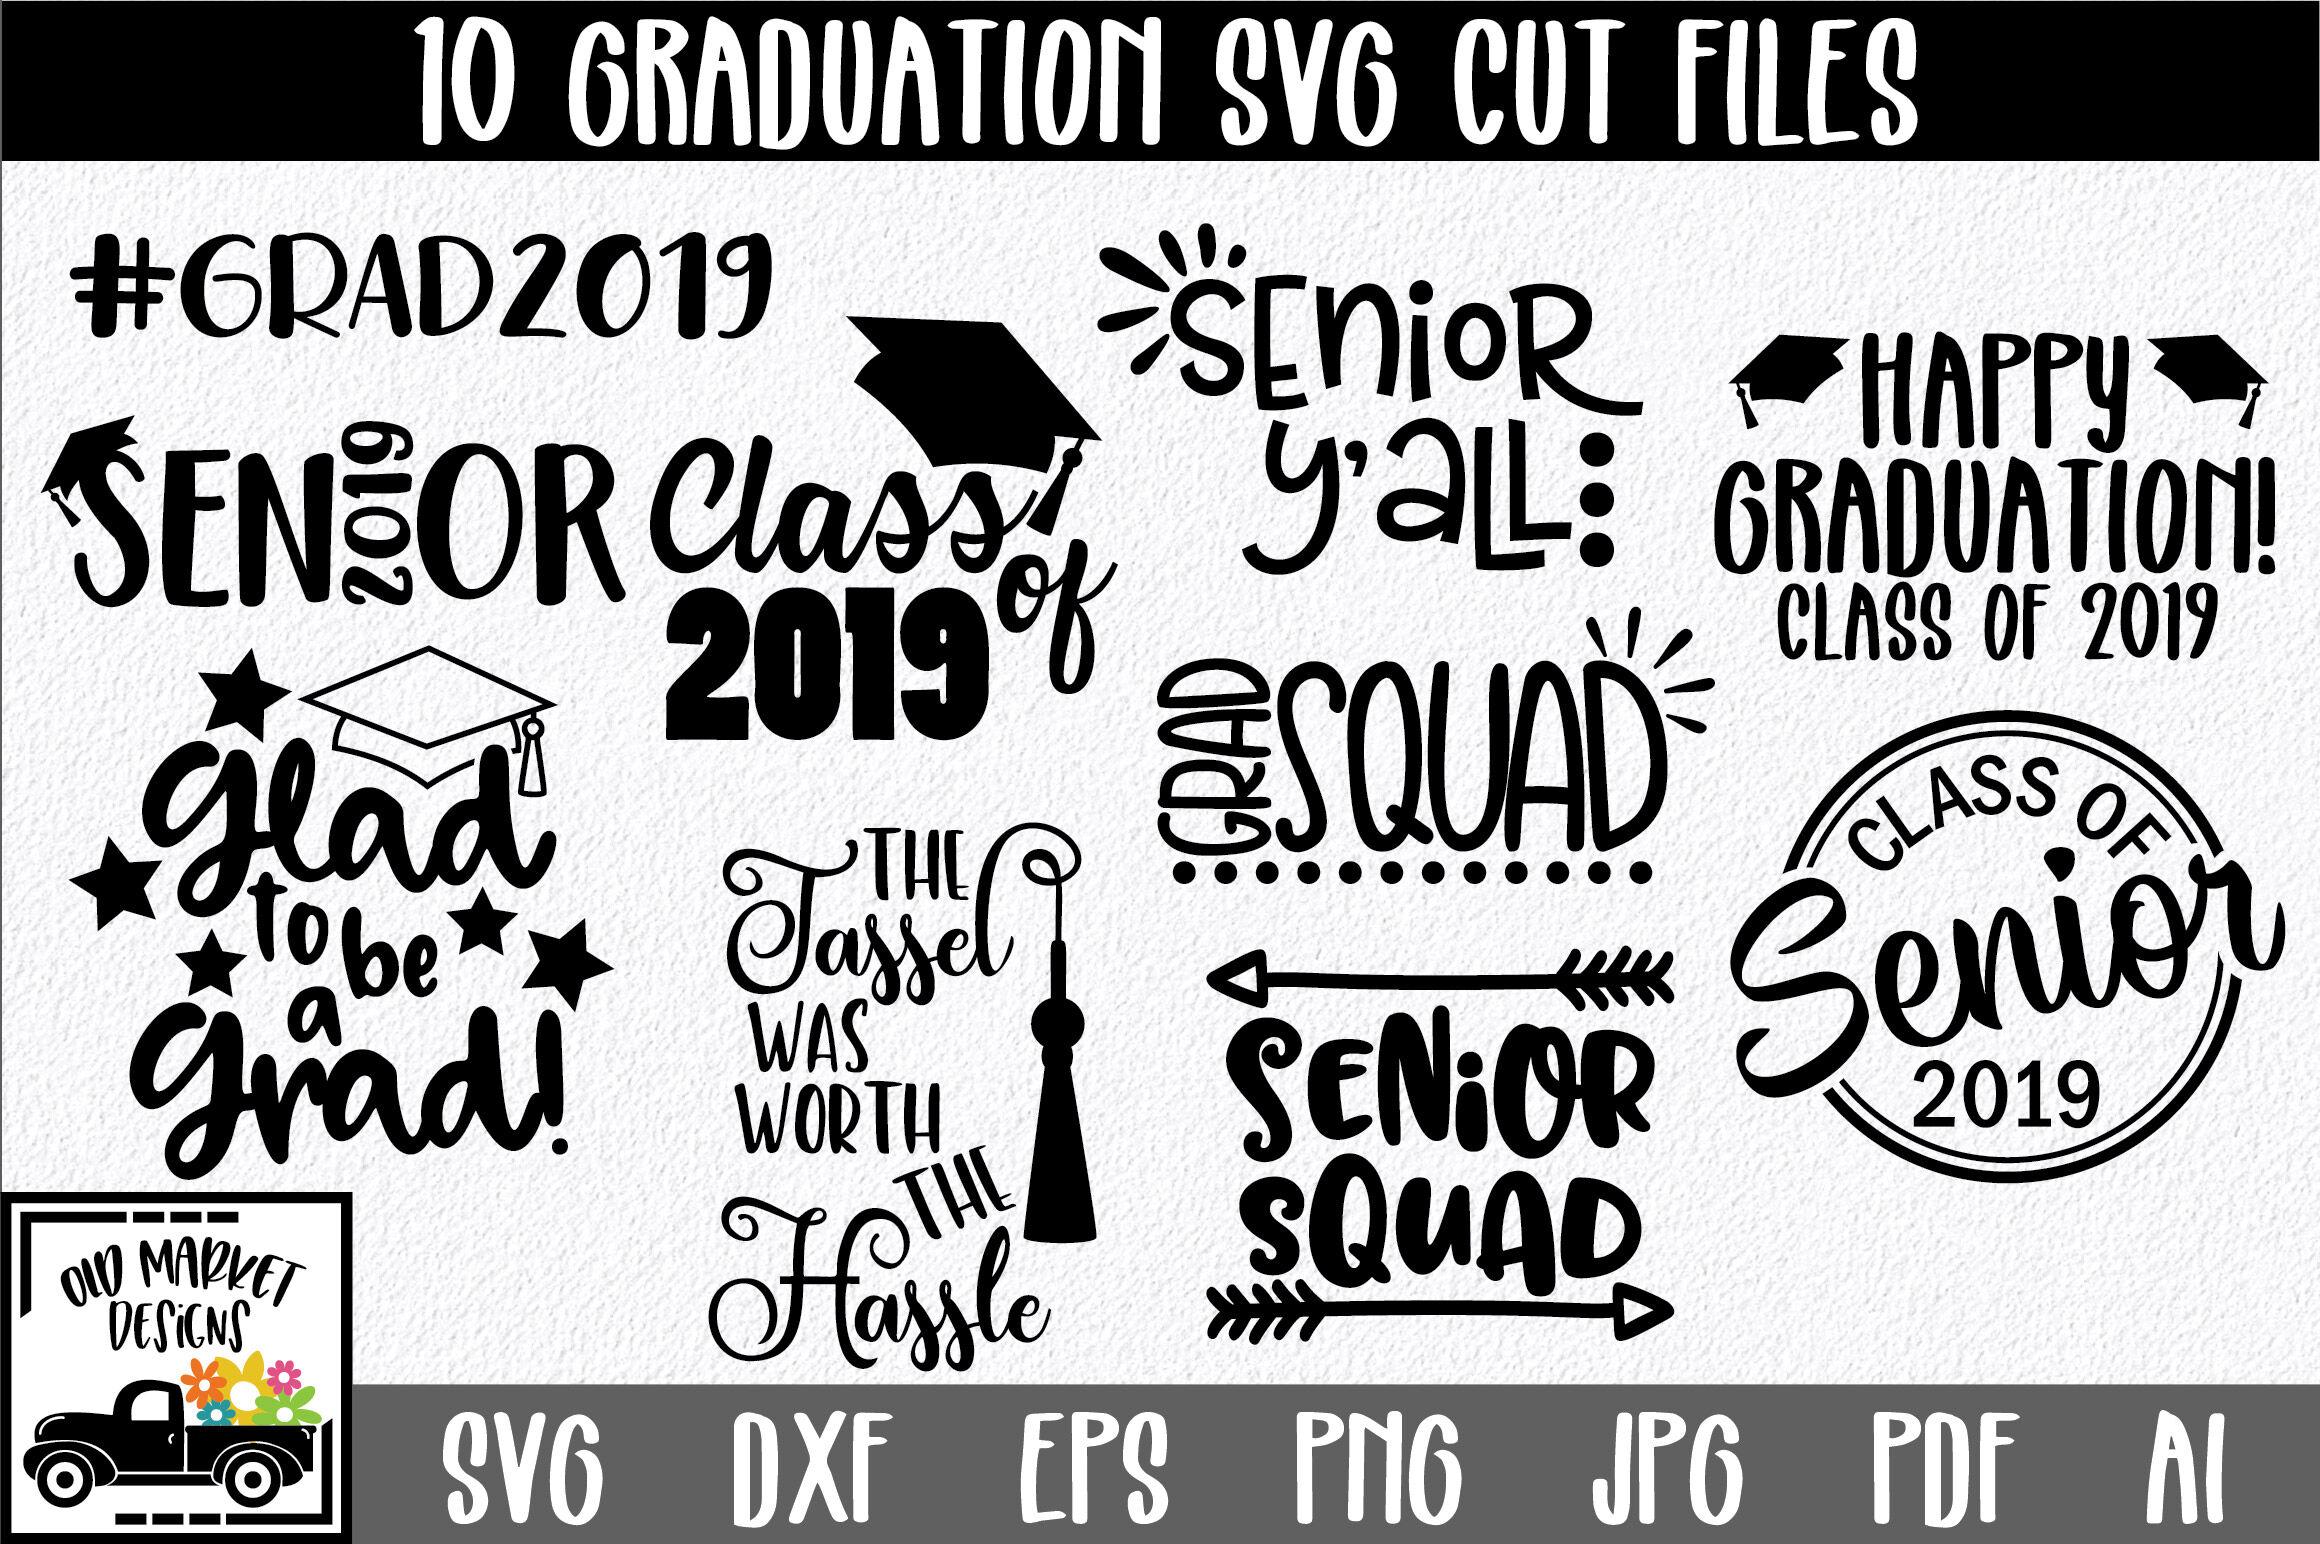 Graduation Svg Mini Bundle With 10 Svg Cut Files By Shannon Keyser